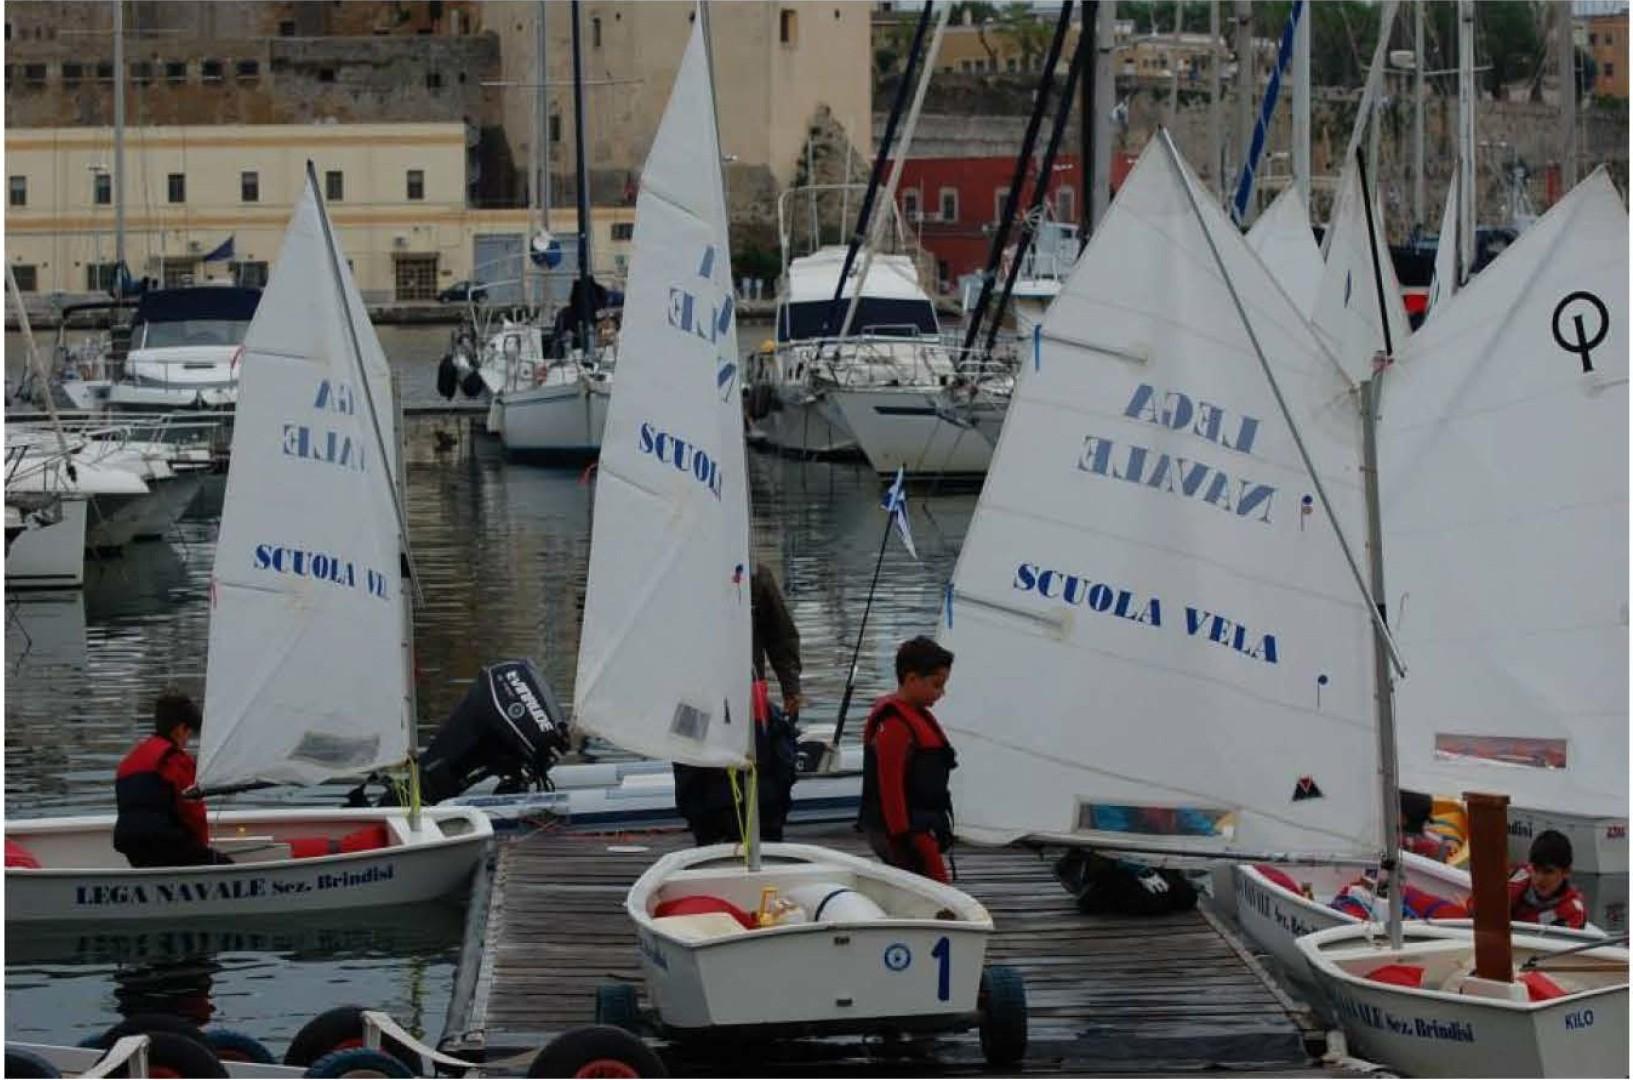 Lega Navale Italiana Brindisi Gruppo Sportivo Vela 7